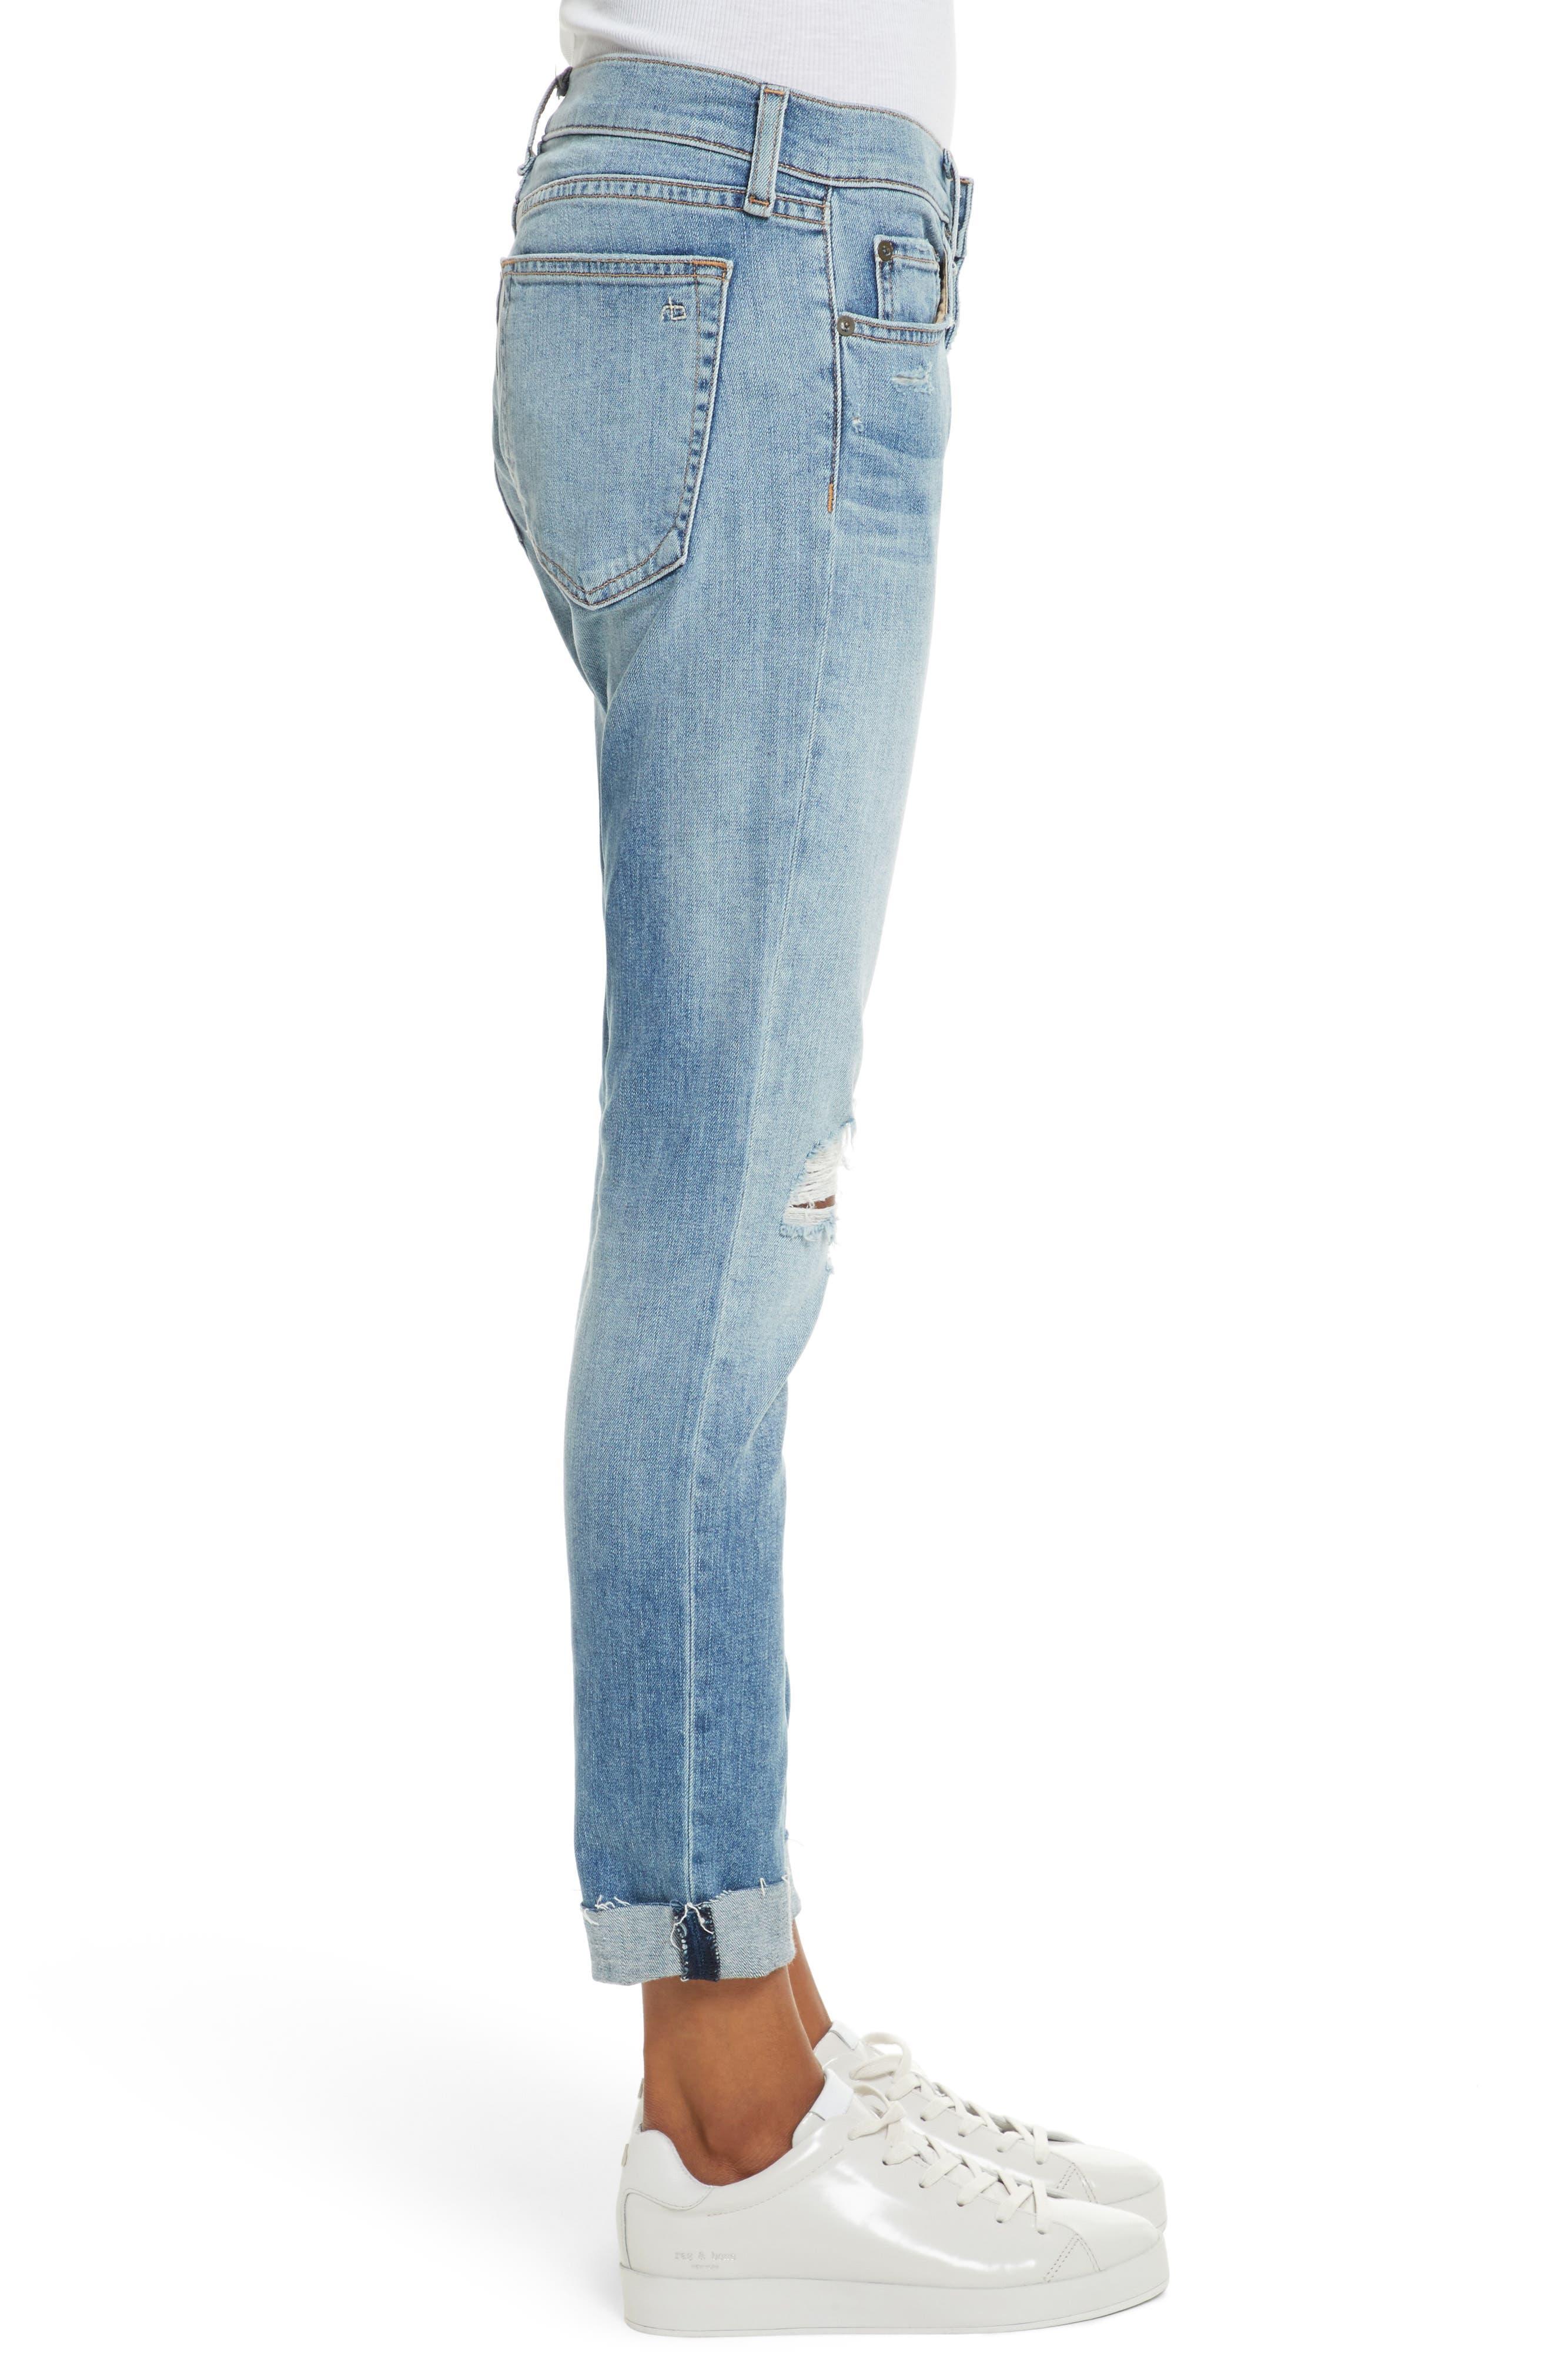 Alternate Image 3  - rag & bone/JEAN The Dre Slim Boyfriend Jeans (June)